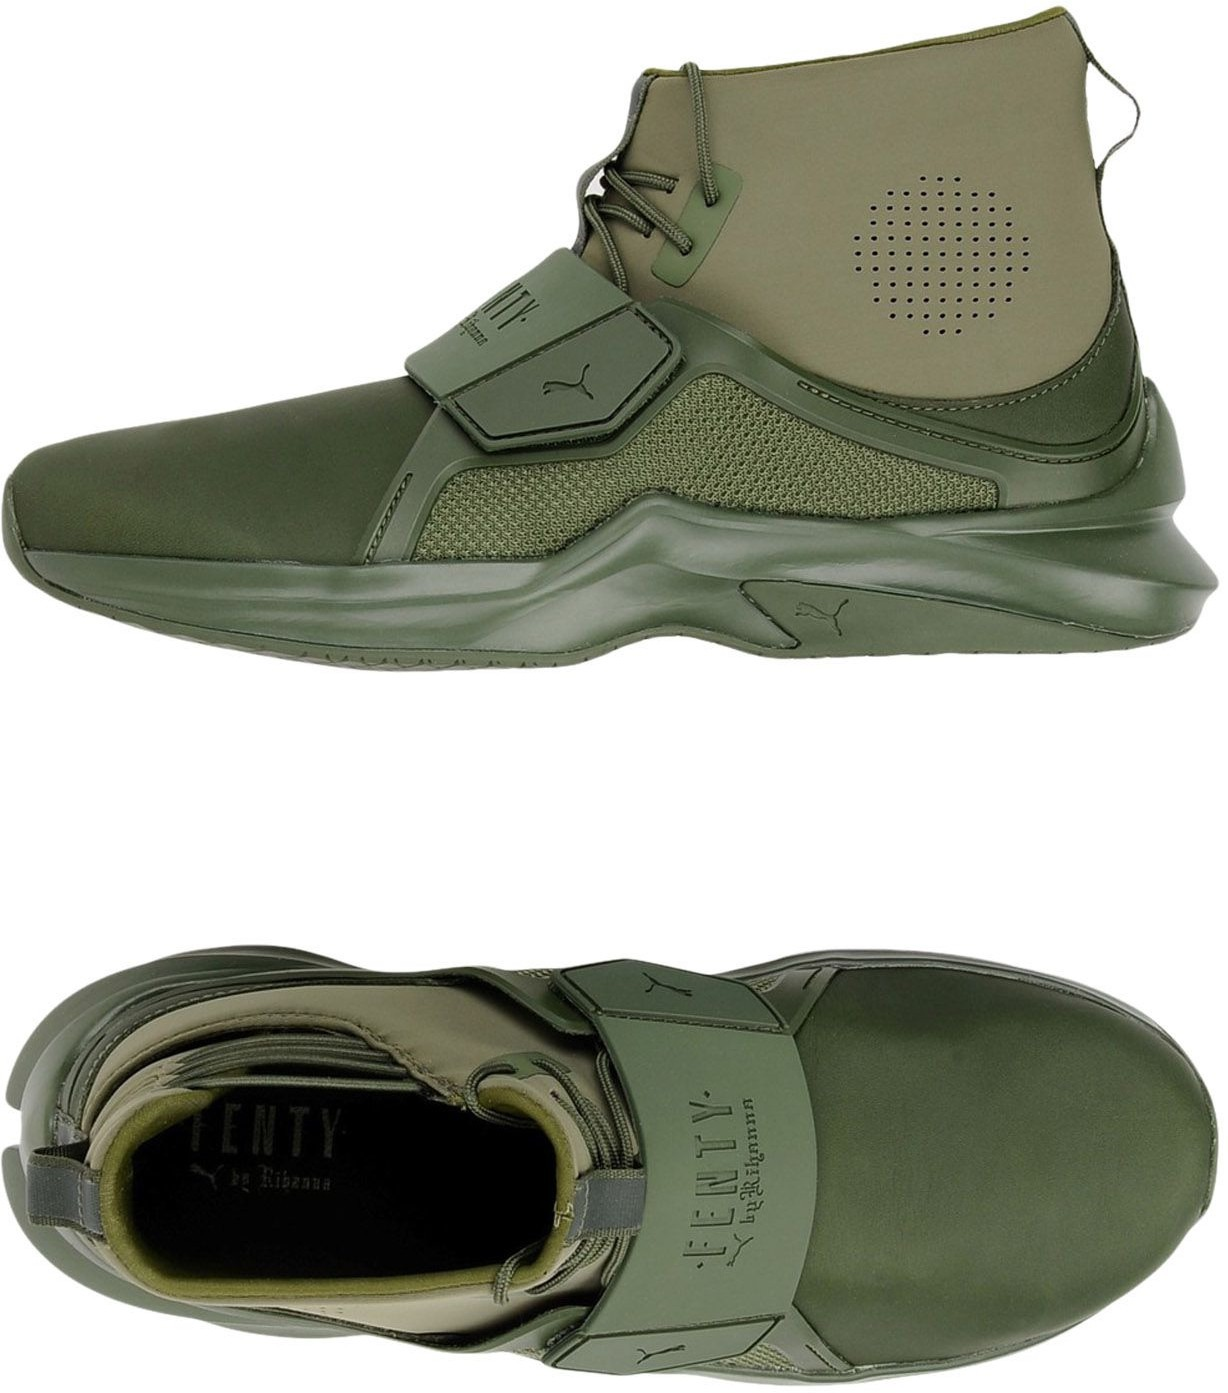 5009a16ee FENTY PUMA by RIHANNA - CALZATURE - Sneakers & Tennis shoes alte ...